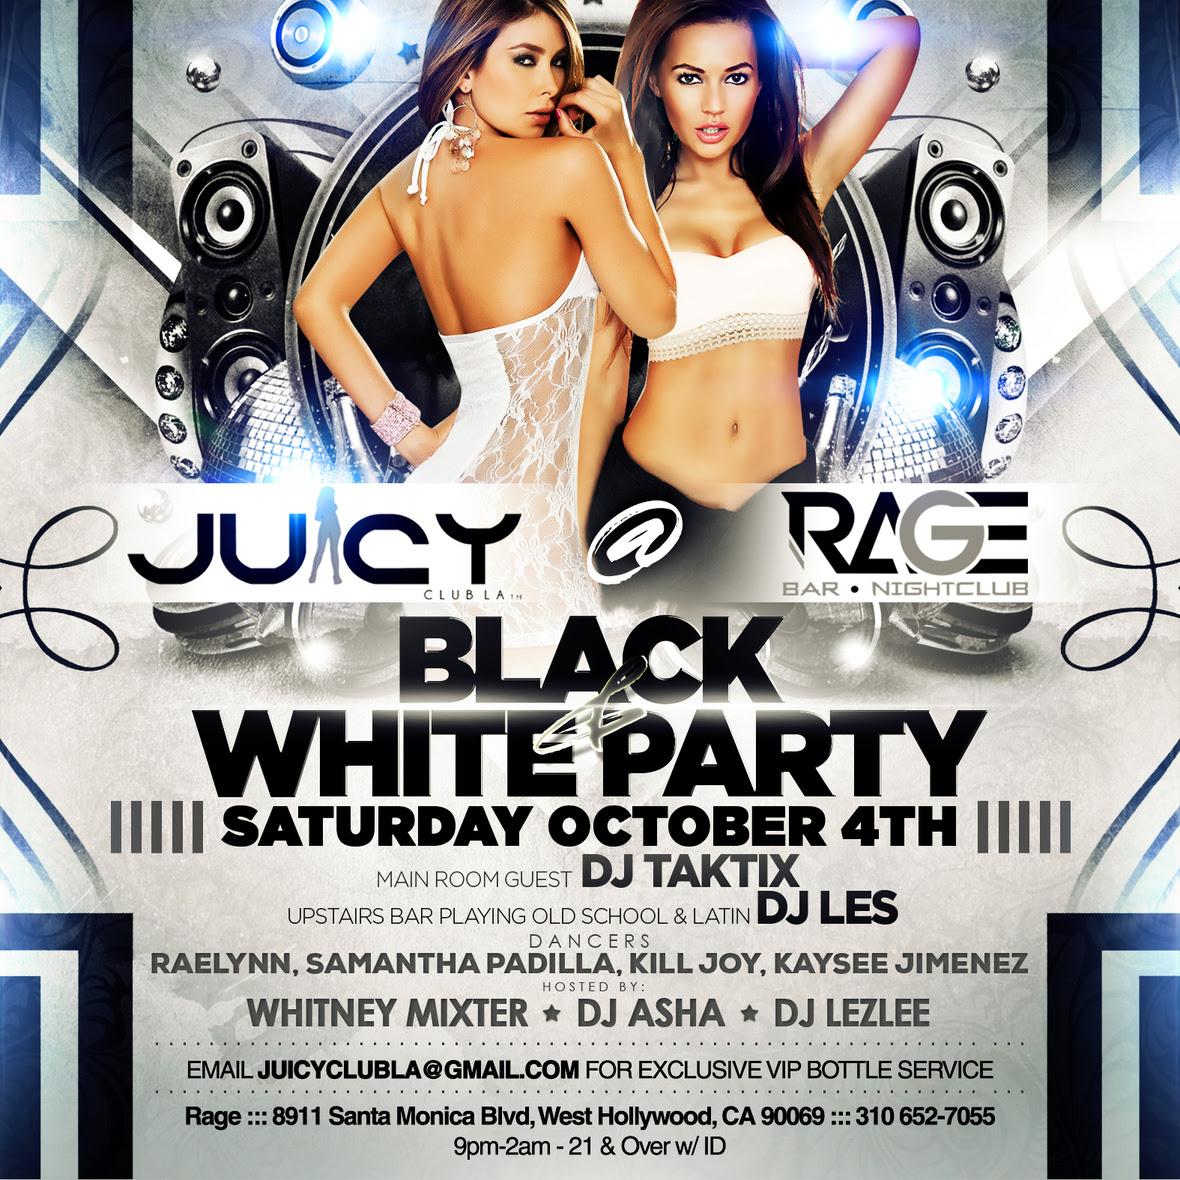 Juicy Black White